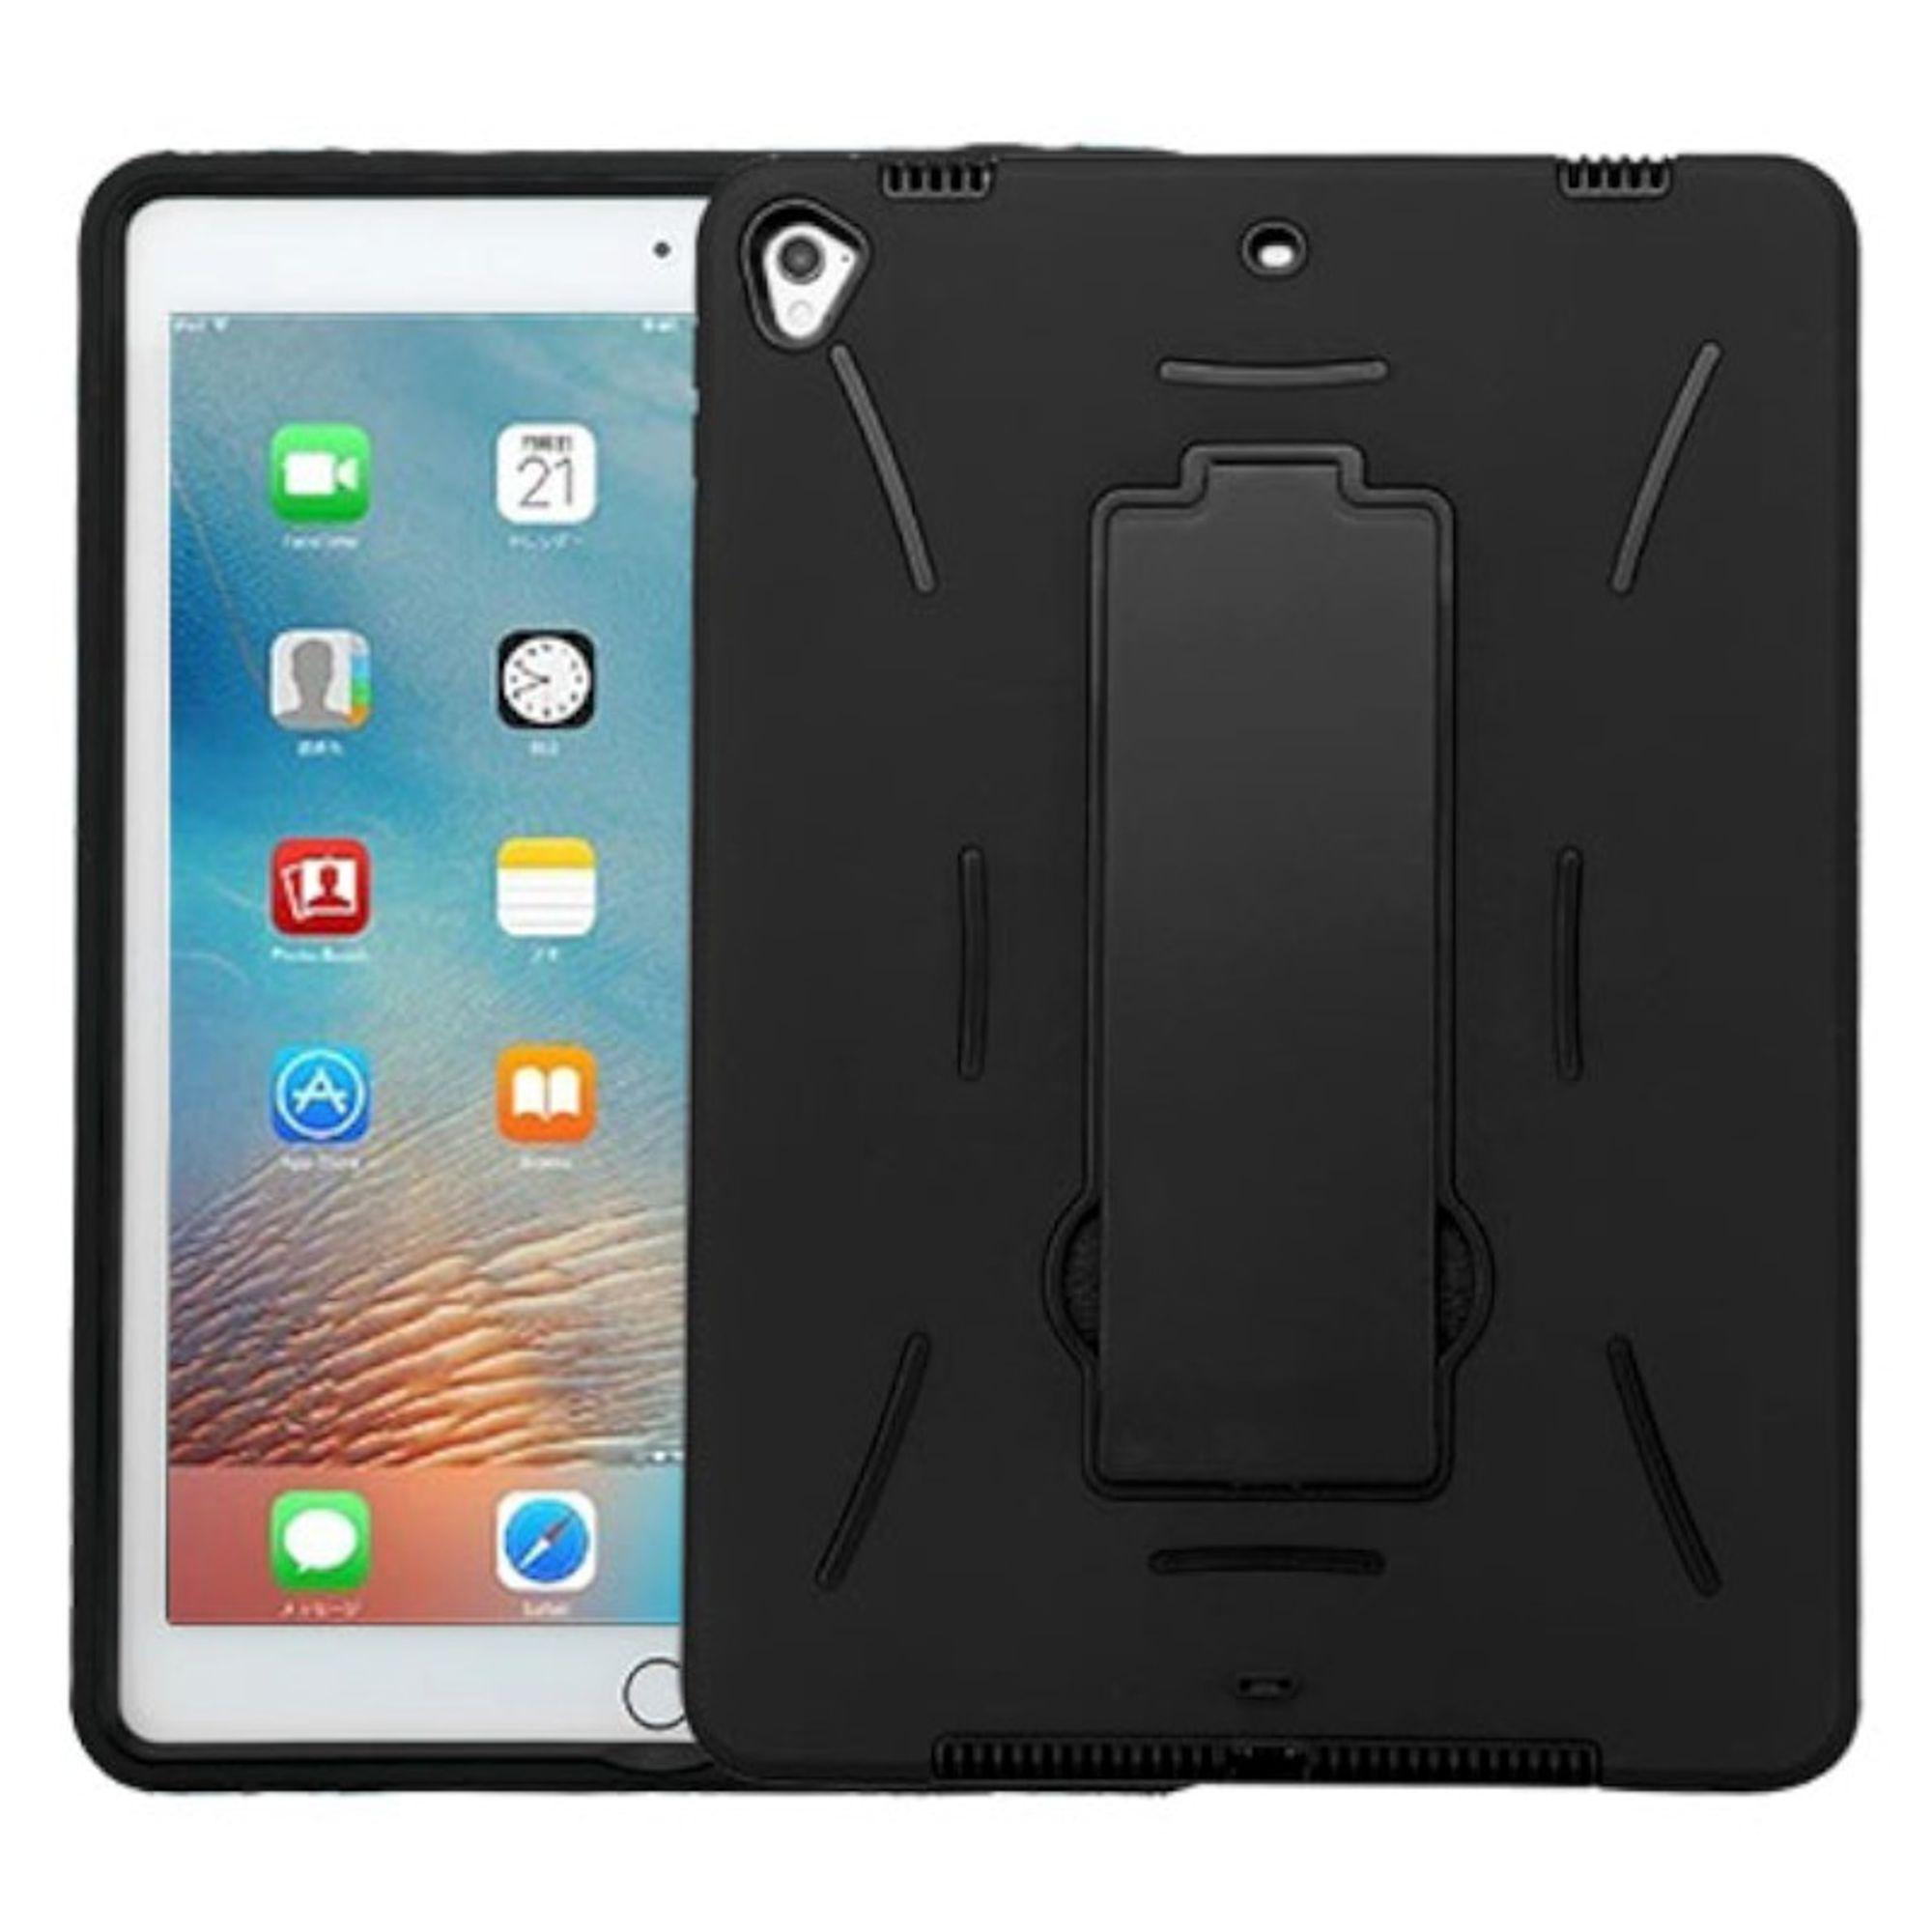 "9.7"" iPad Pro  Case Symbiosis Skin Hybrid Rubber Hard Case w/ Stand by Insten For Apple iPad Pro (9.7"") - Black"